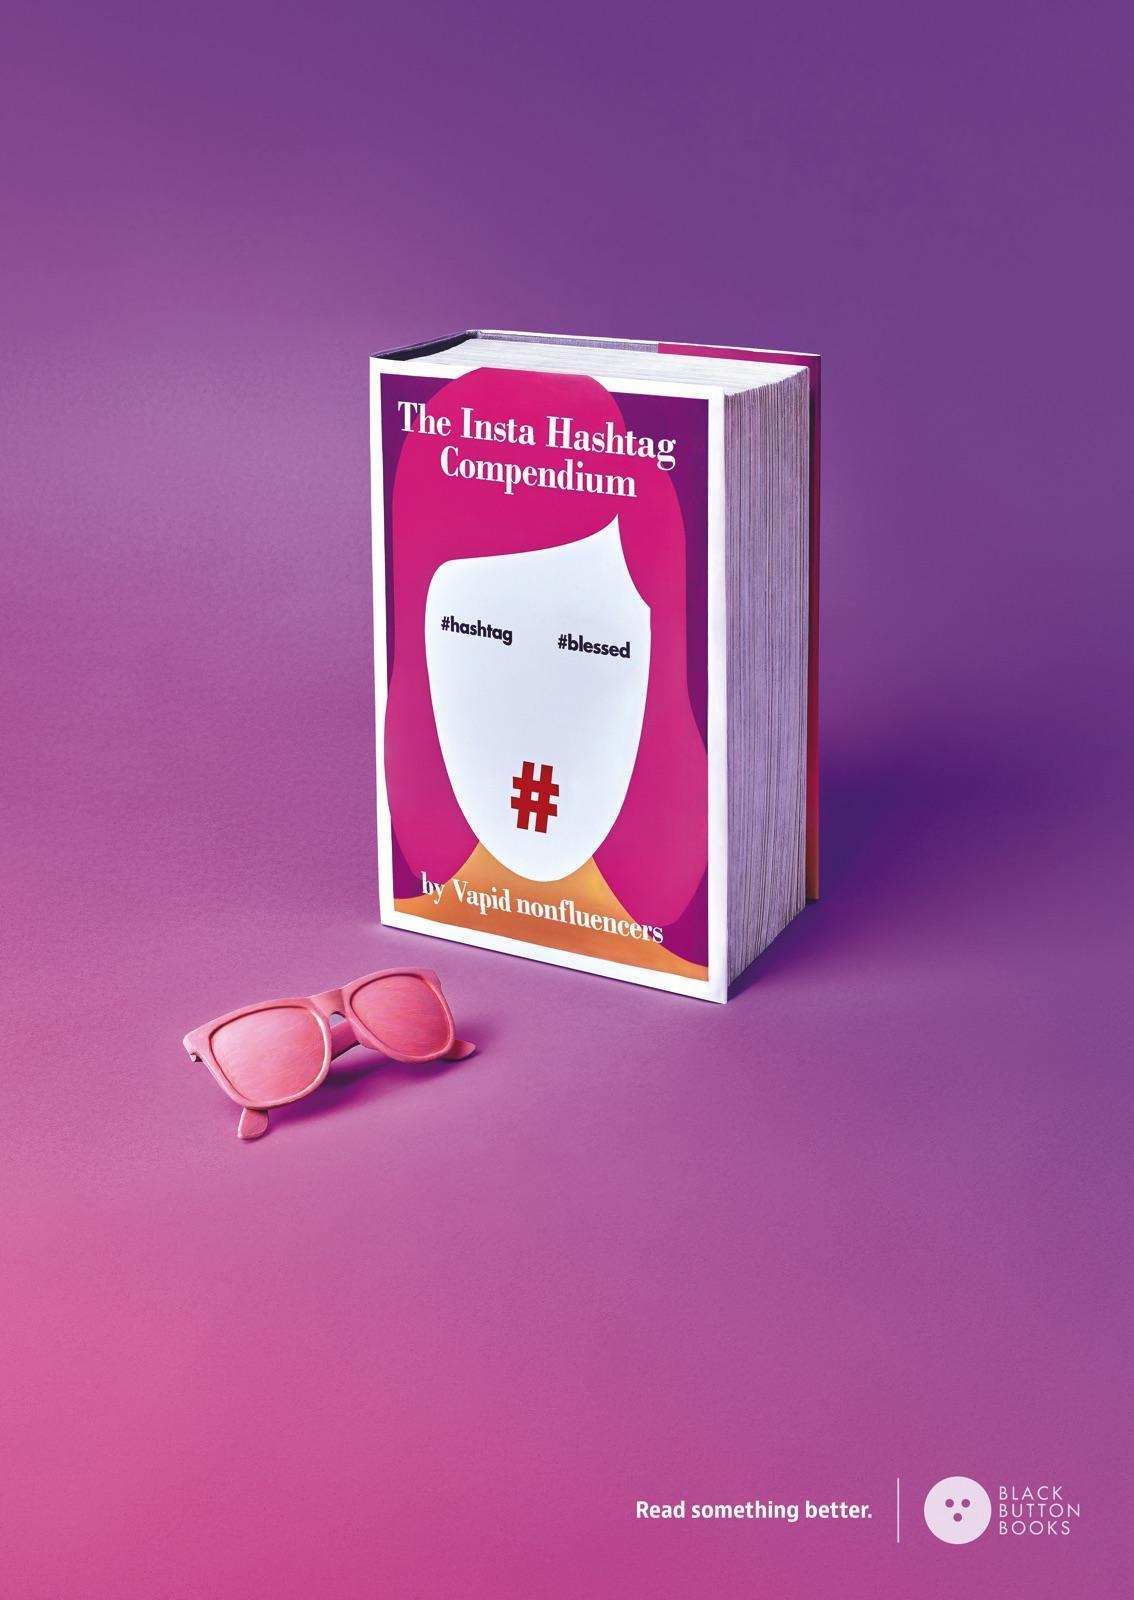 black_button_books_-_hashtag_compendium_thumb